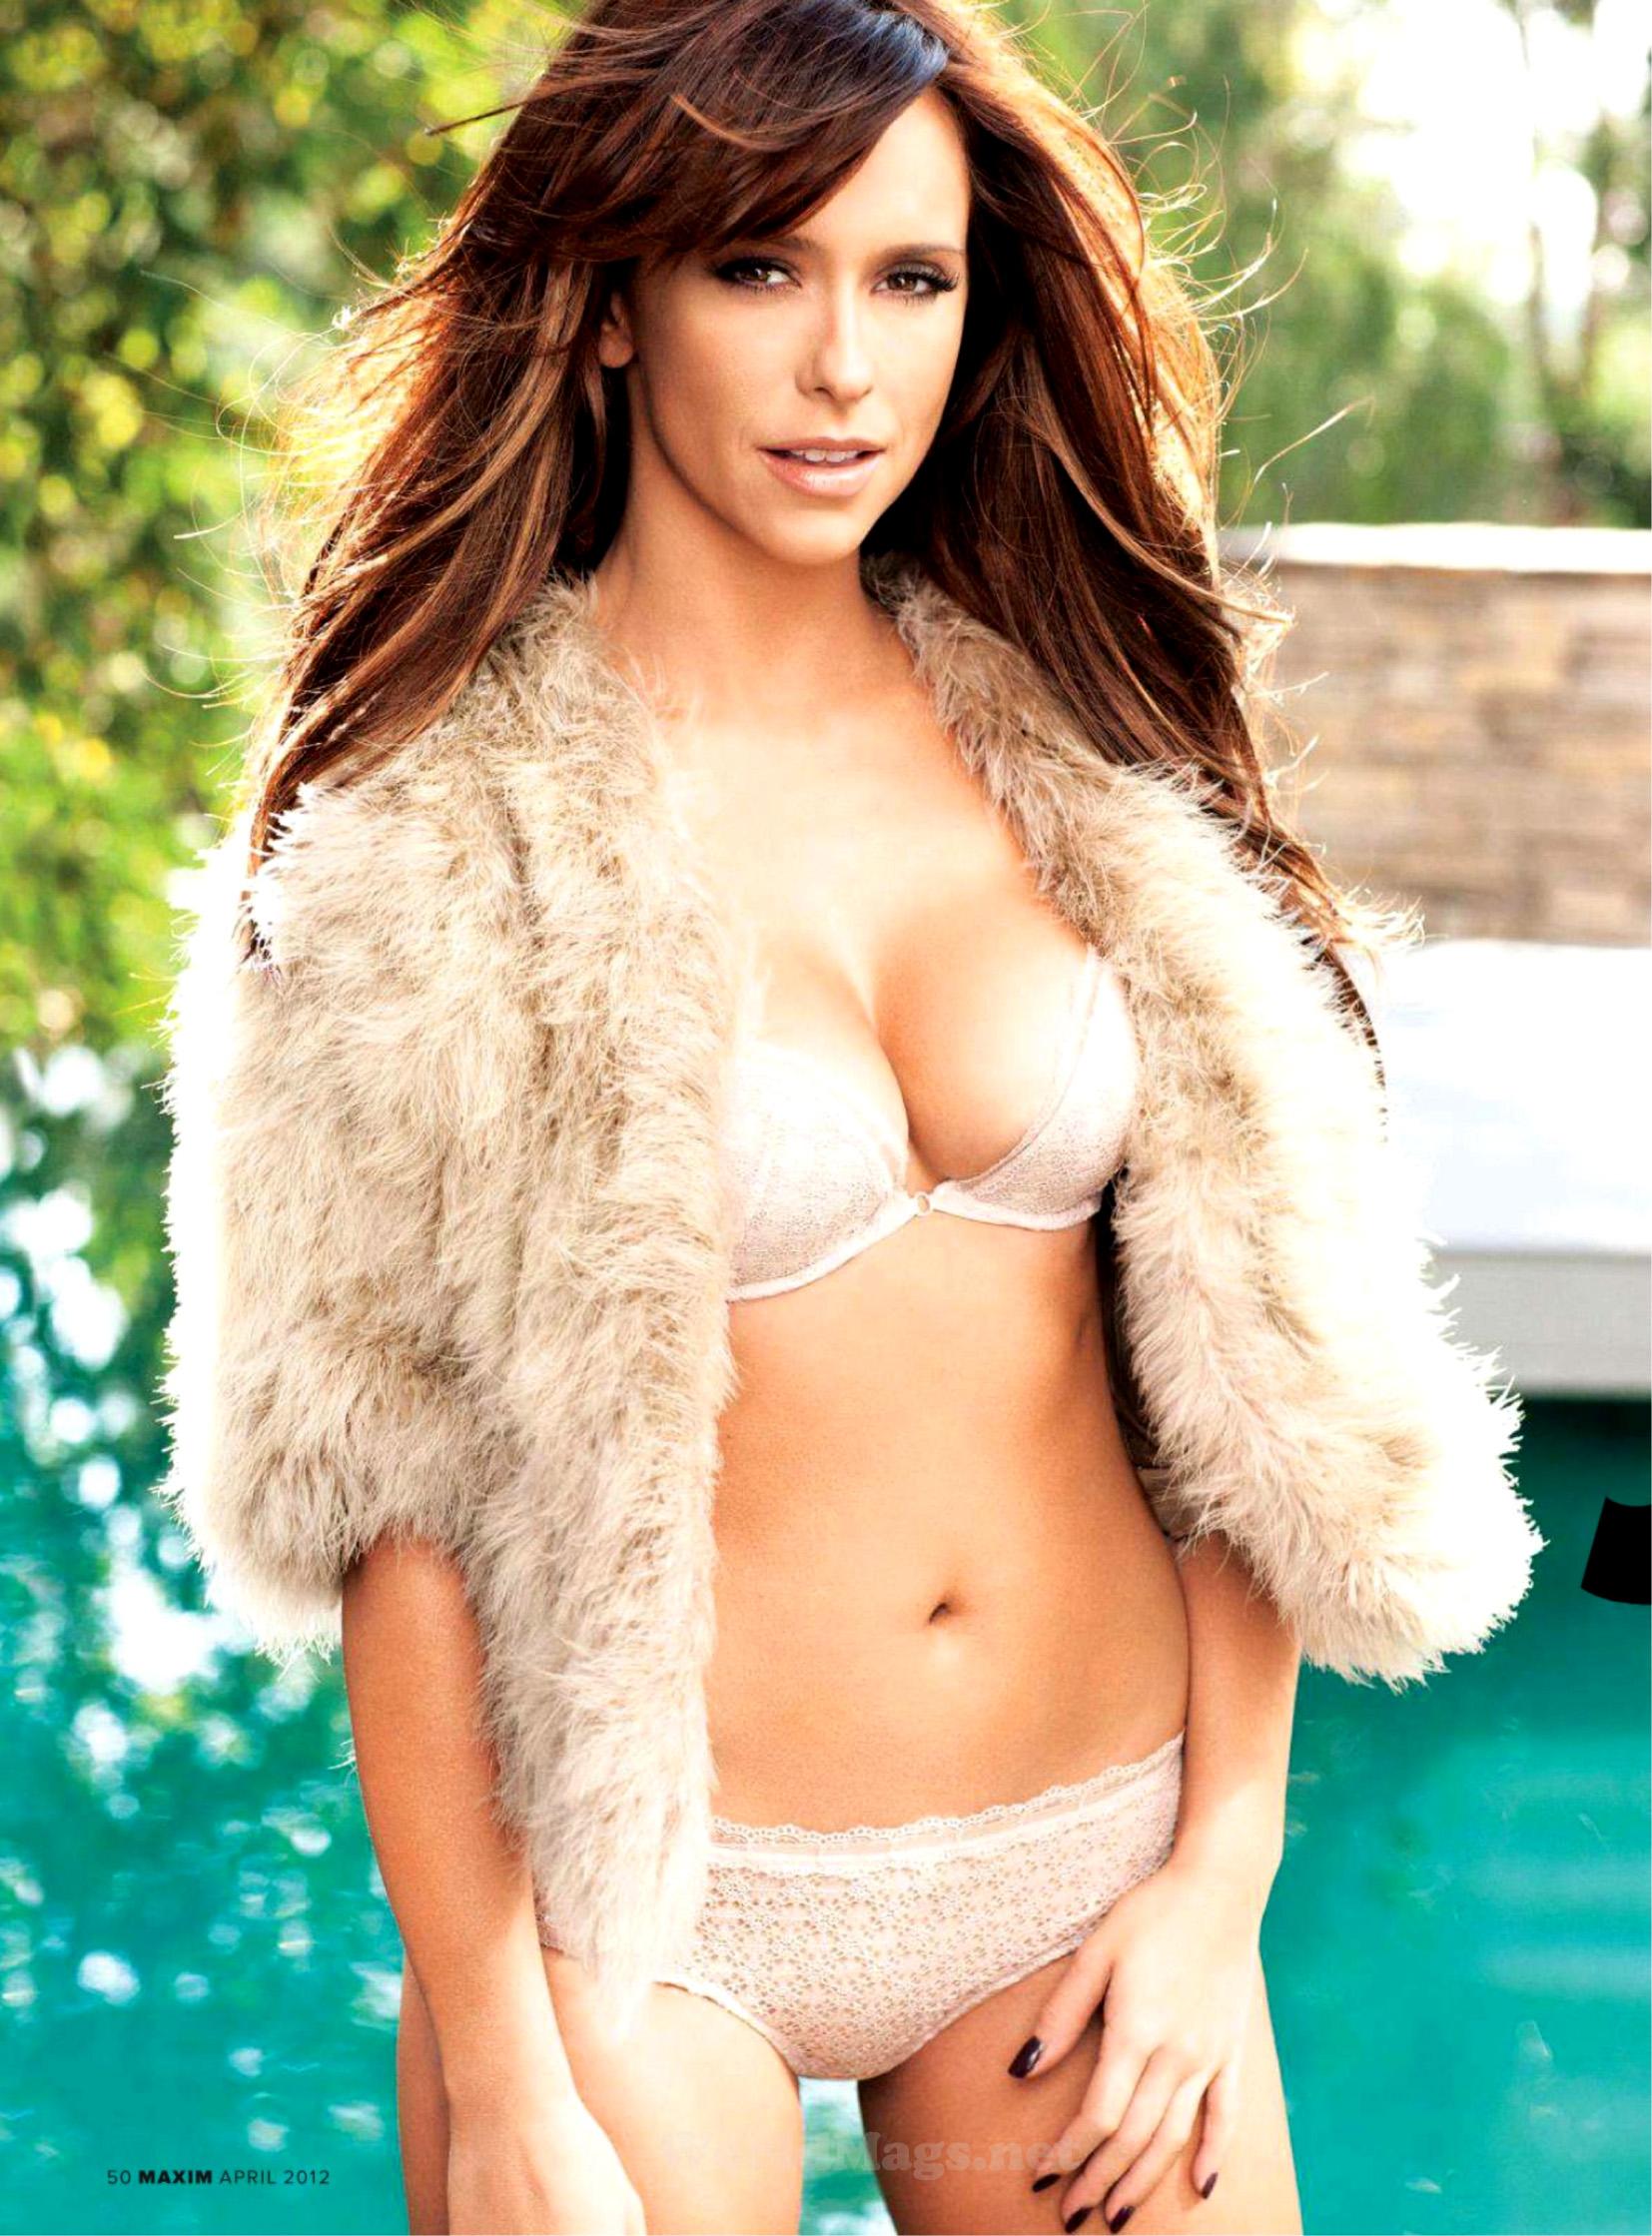 Jennifer Love Hewitt 2013 : Jennifer Love Hewitt – Maxim 2012 -16